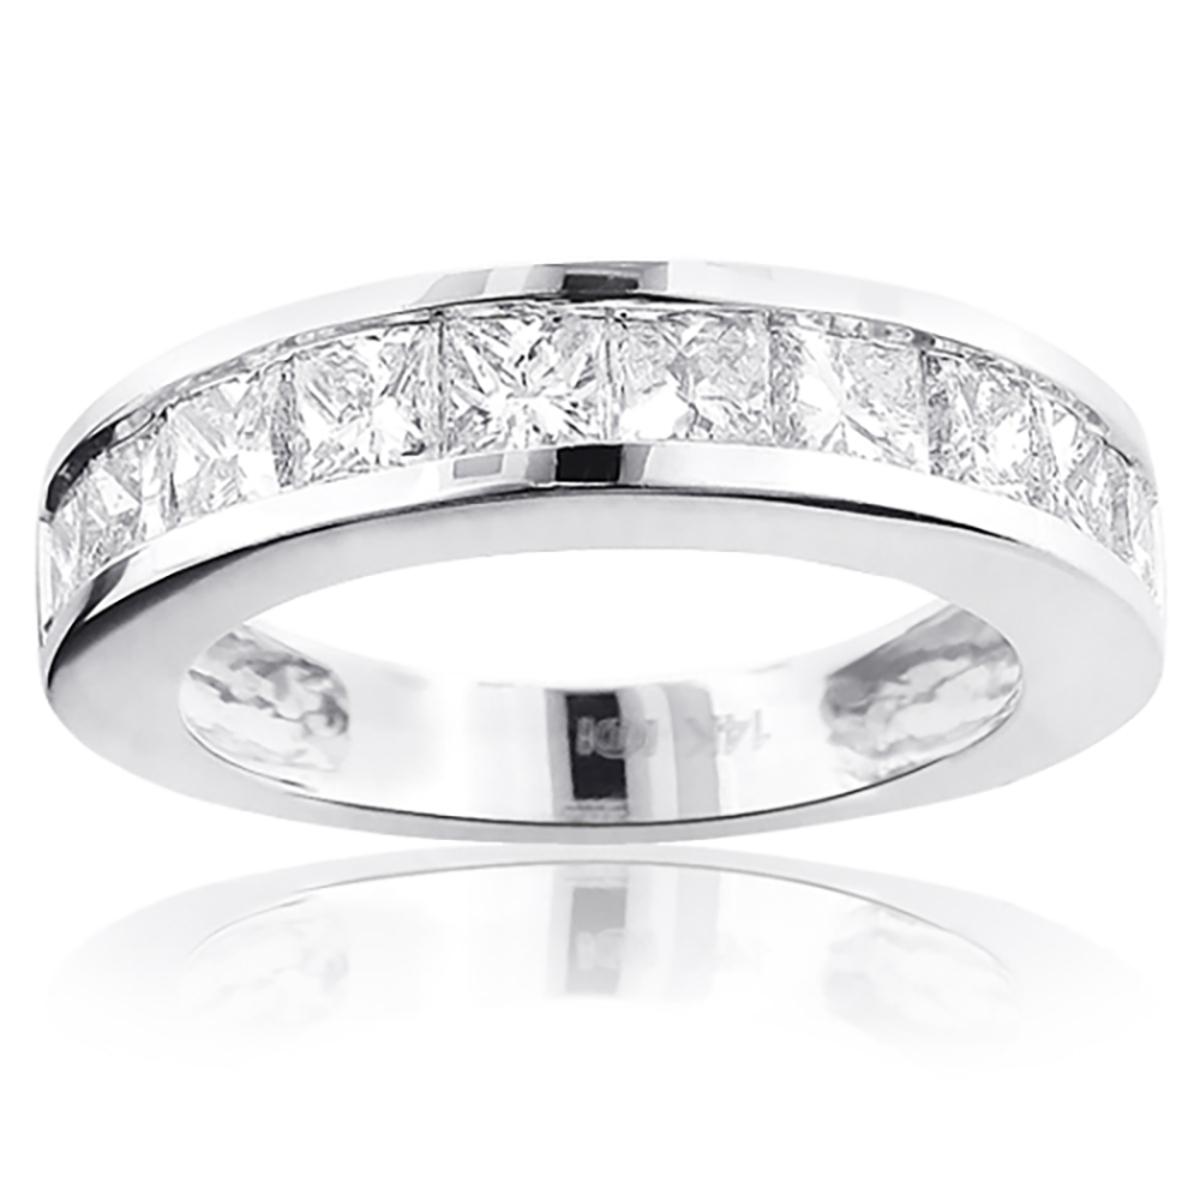 Large Princess Cut Diamond Wedding Band 2.5ct 14K Gold